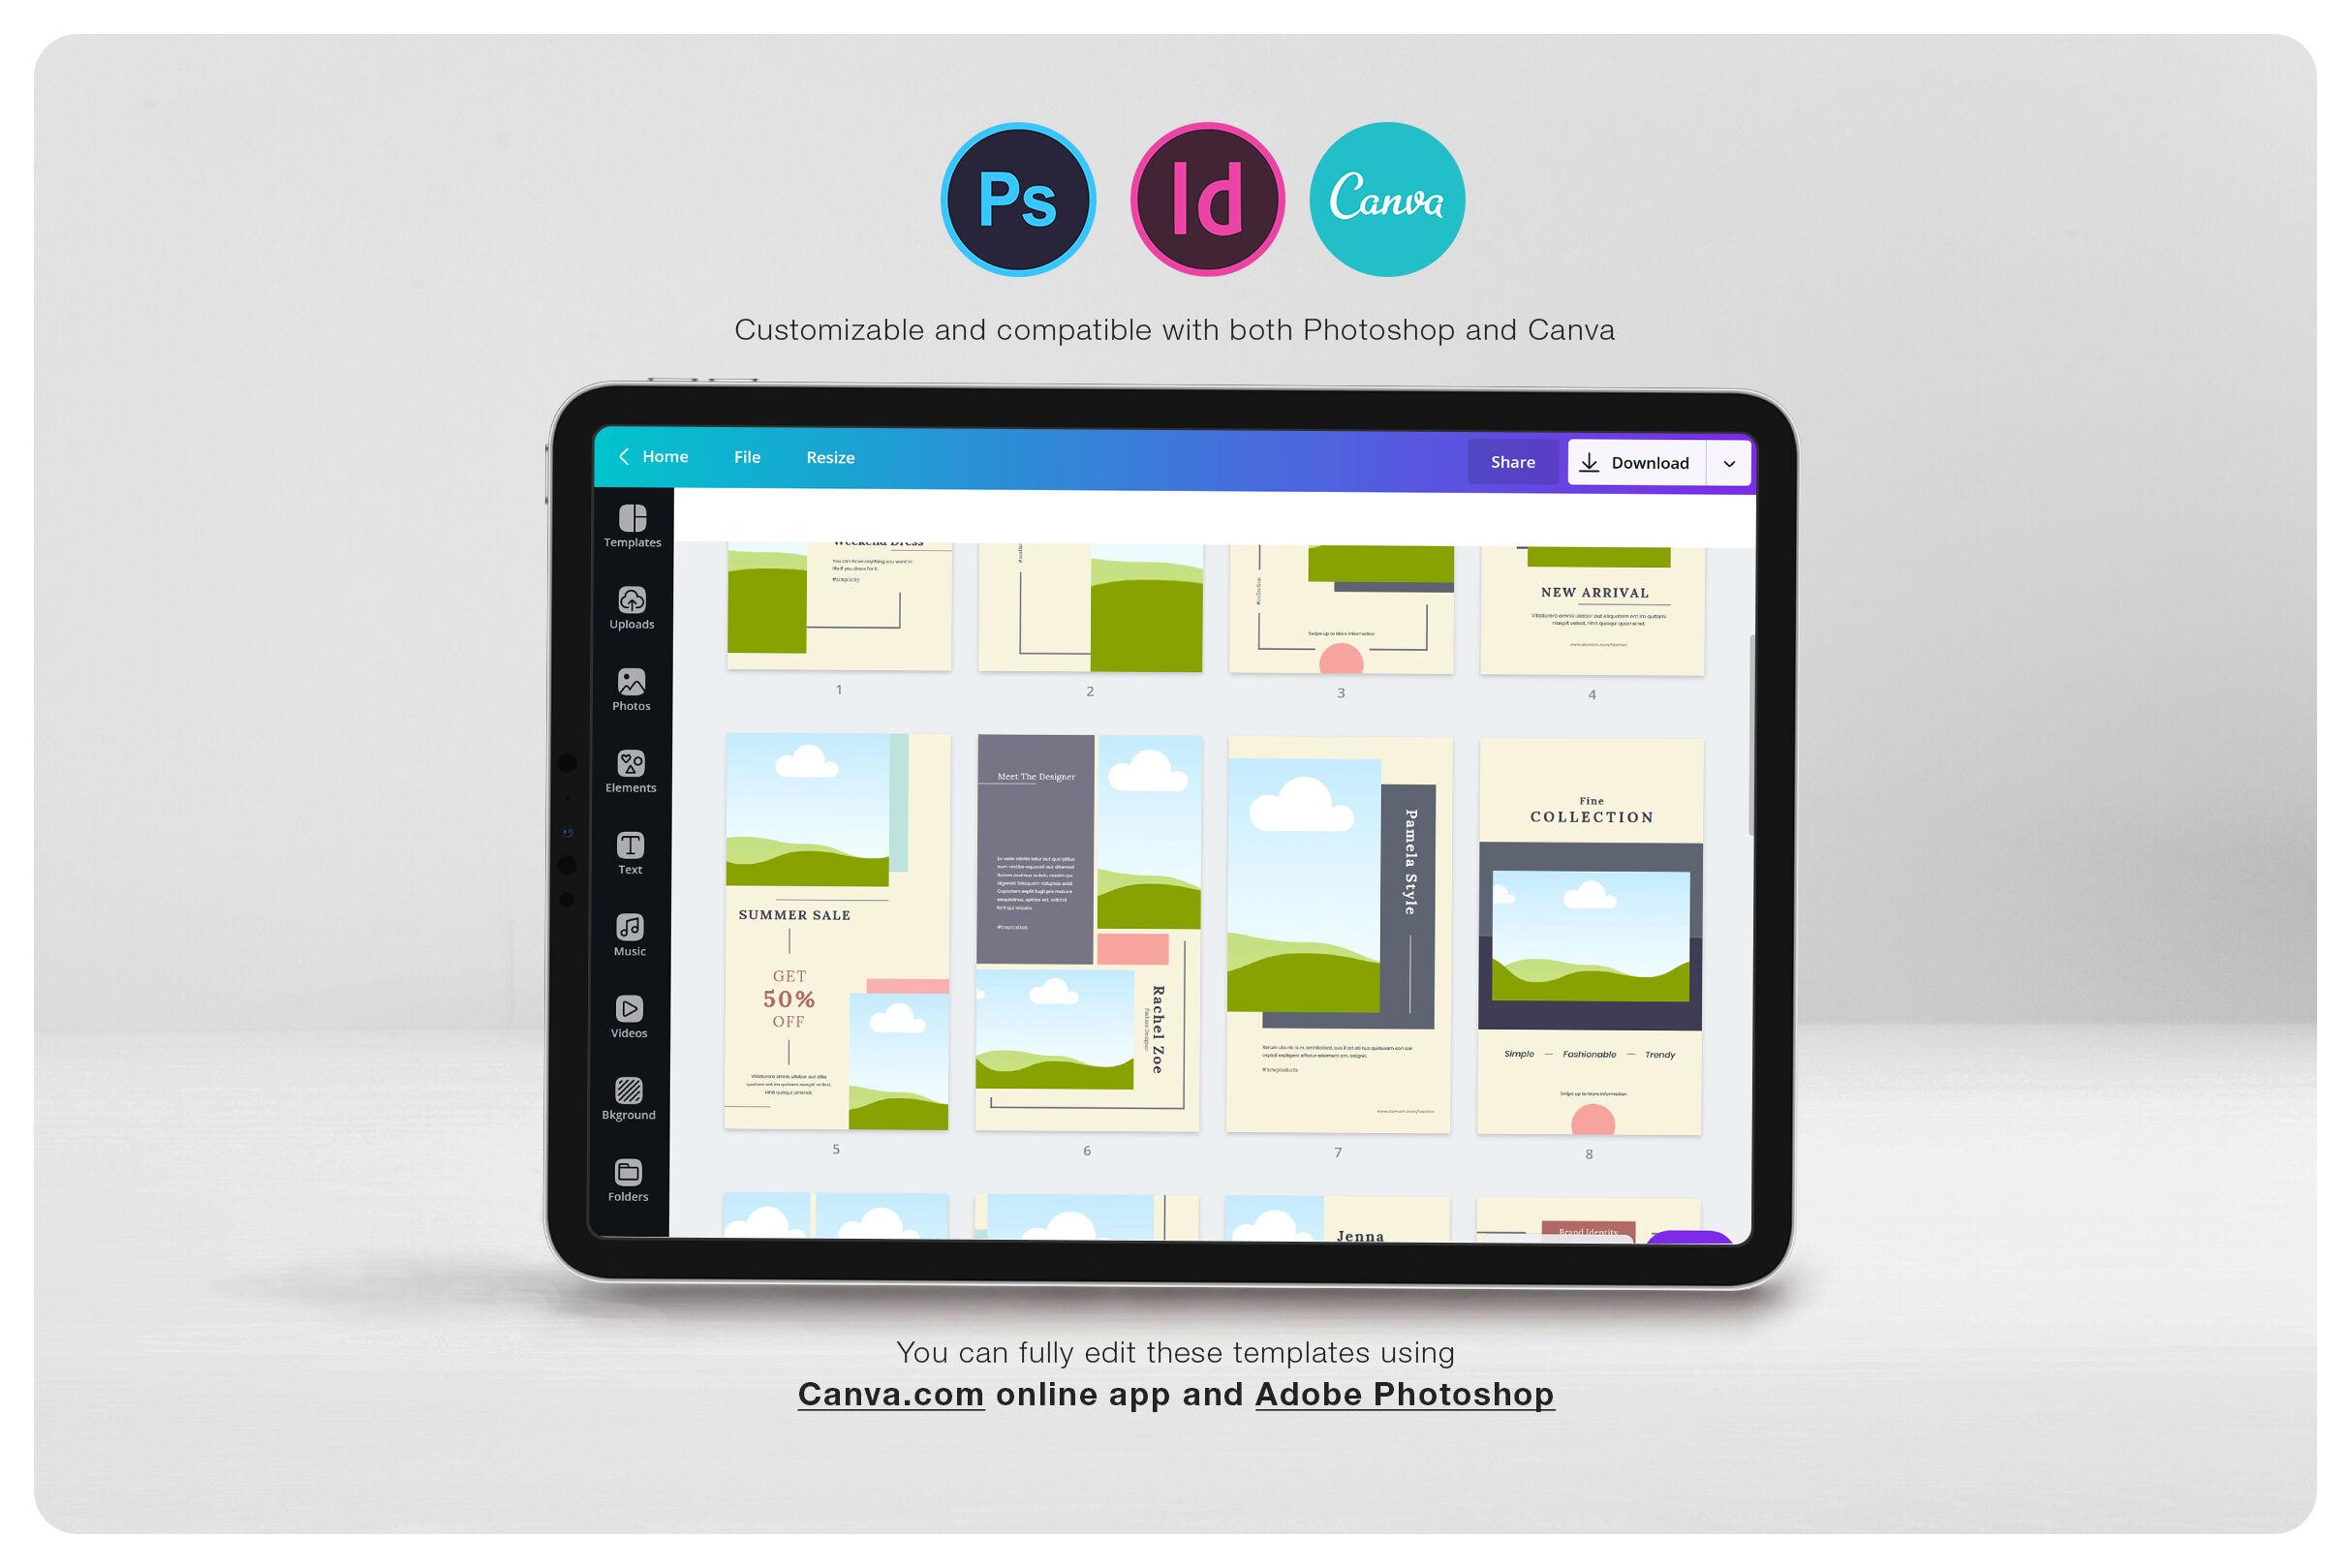 Ipad Iphone Imac Mockup Psd Template